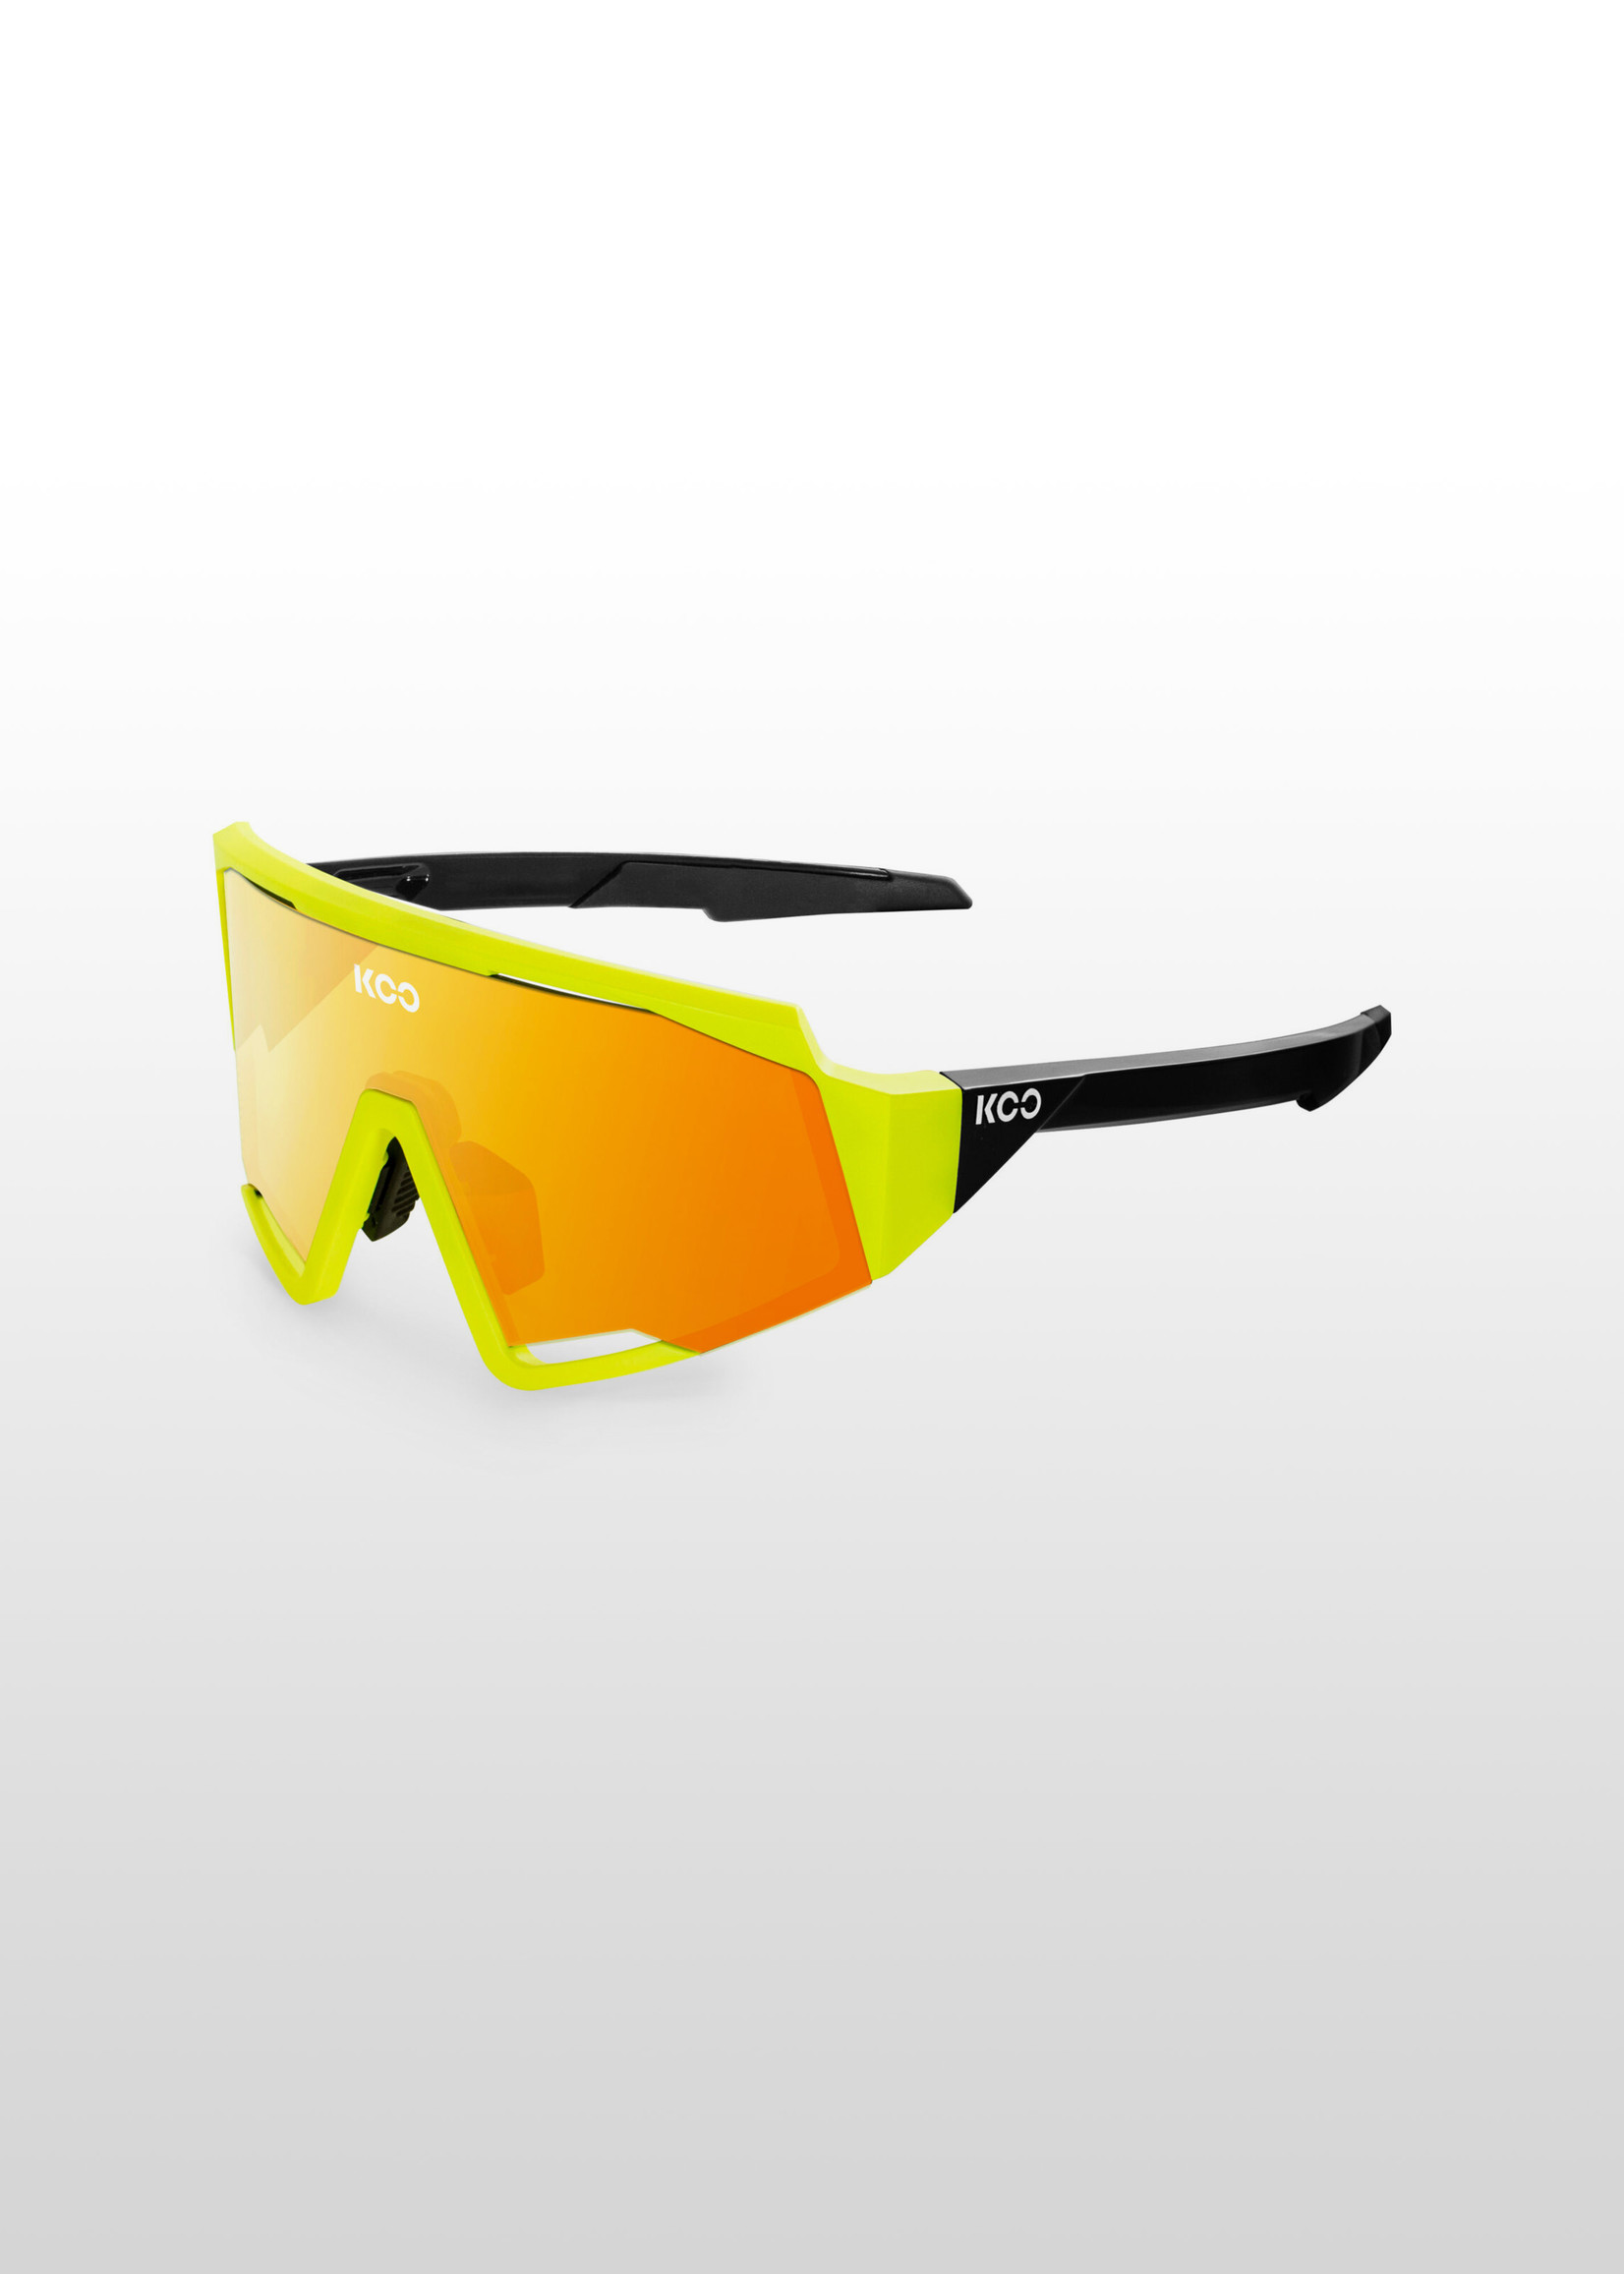 KOO Spectro Sunglasses - Ltd Edition